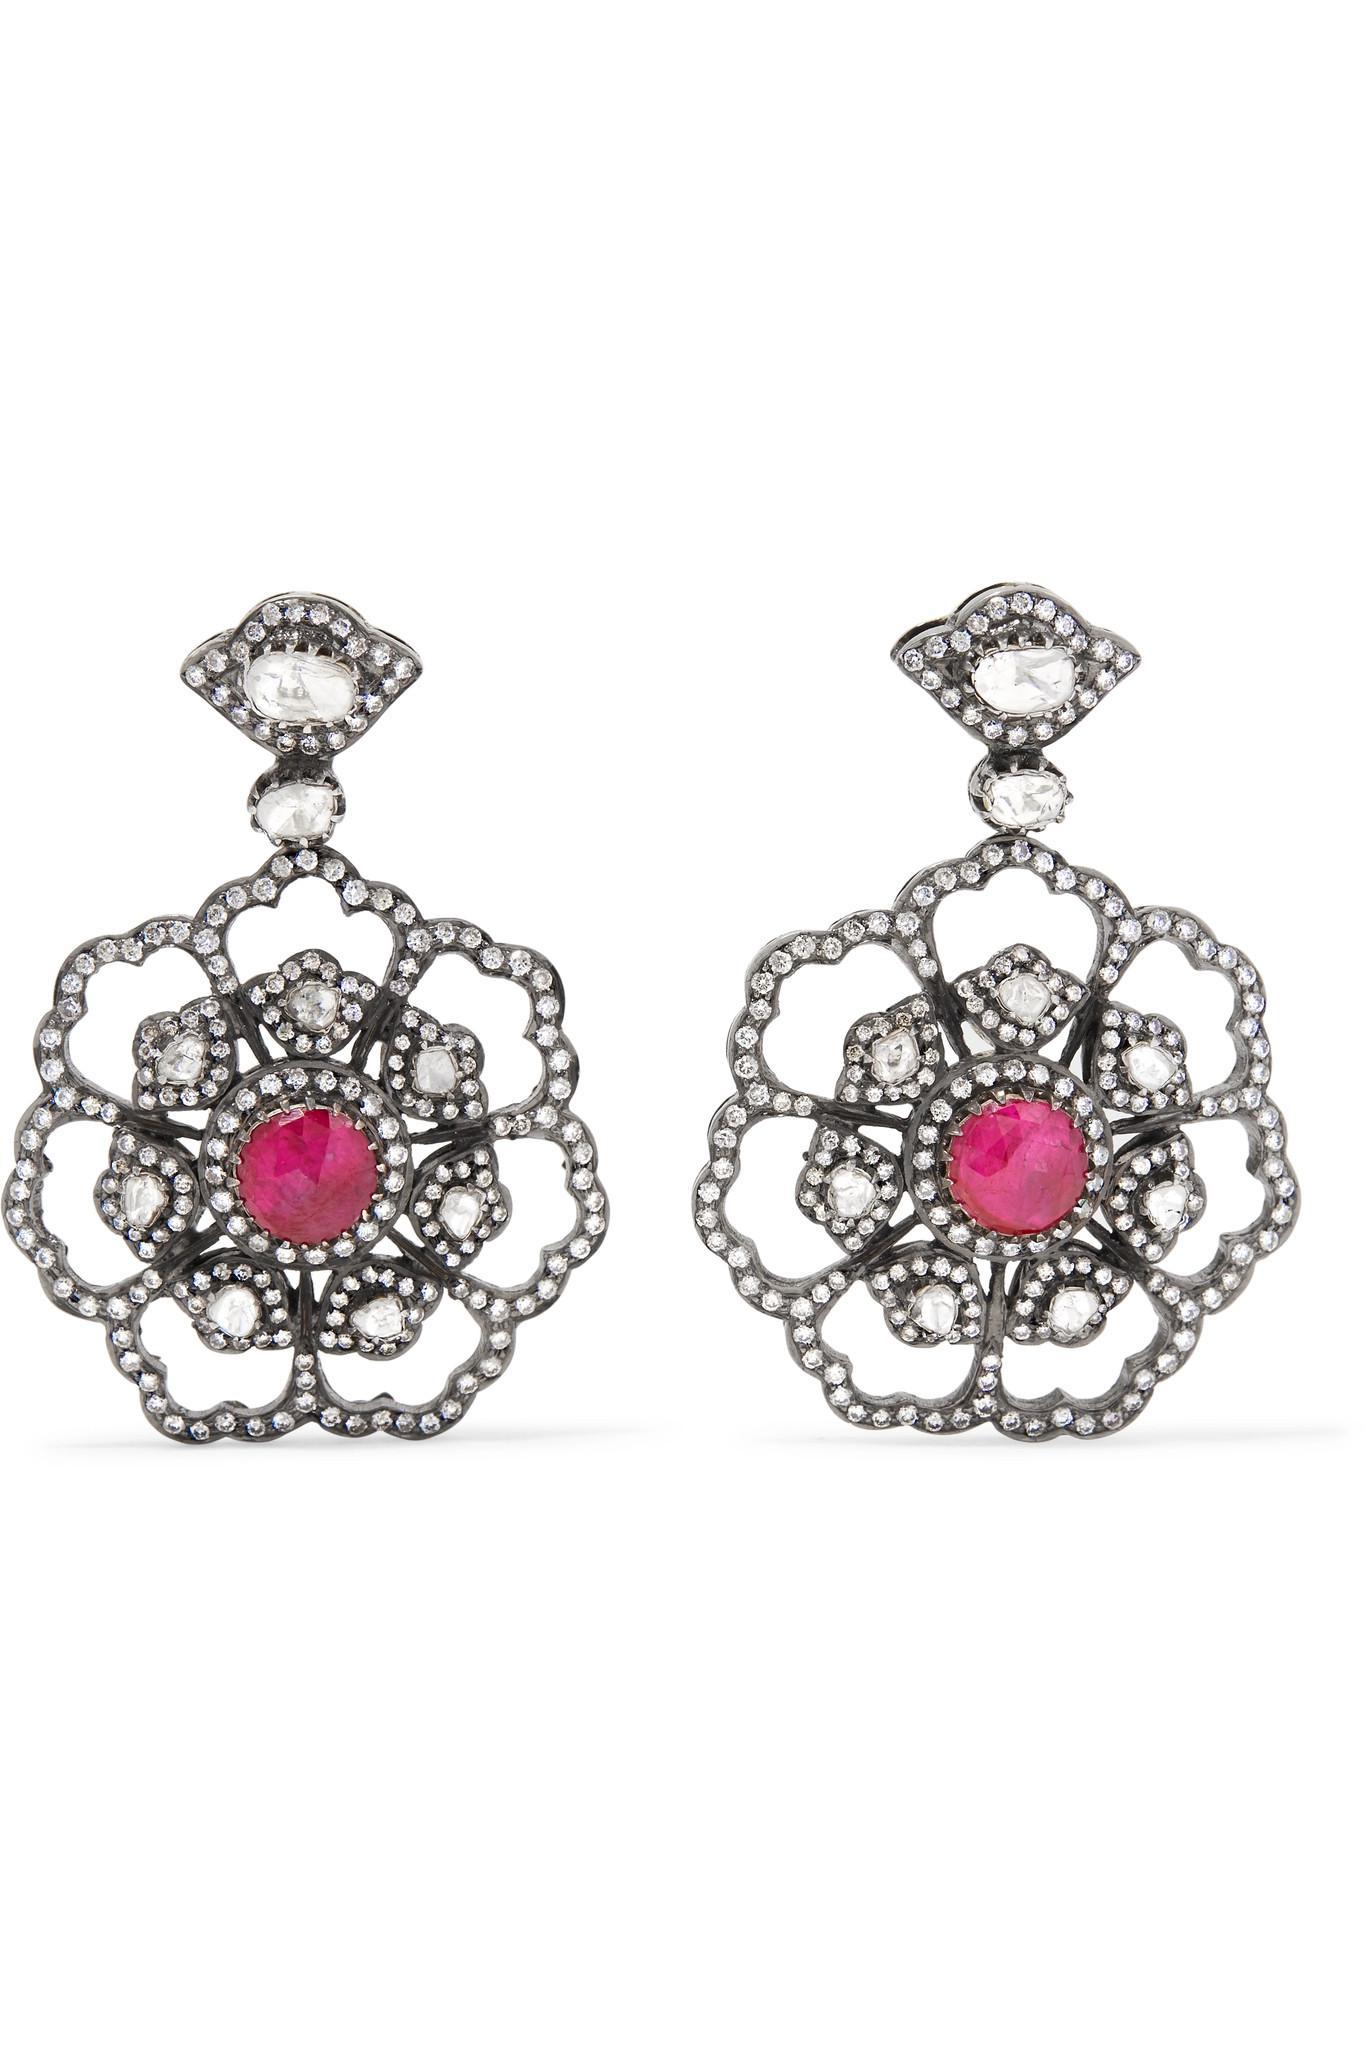 Amrapali 18-karat Gold, Sterling Silver, Diamond And Ruby Earrings